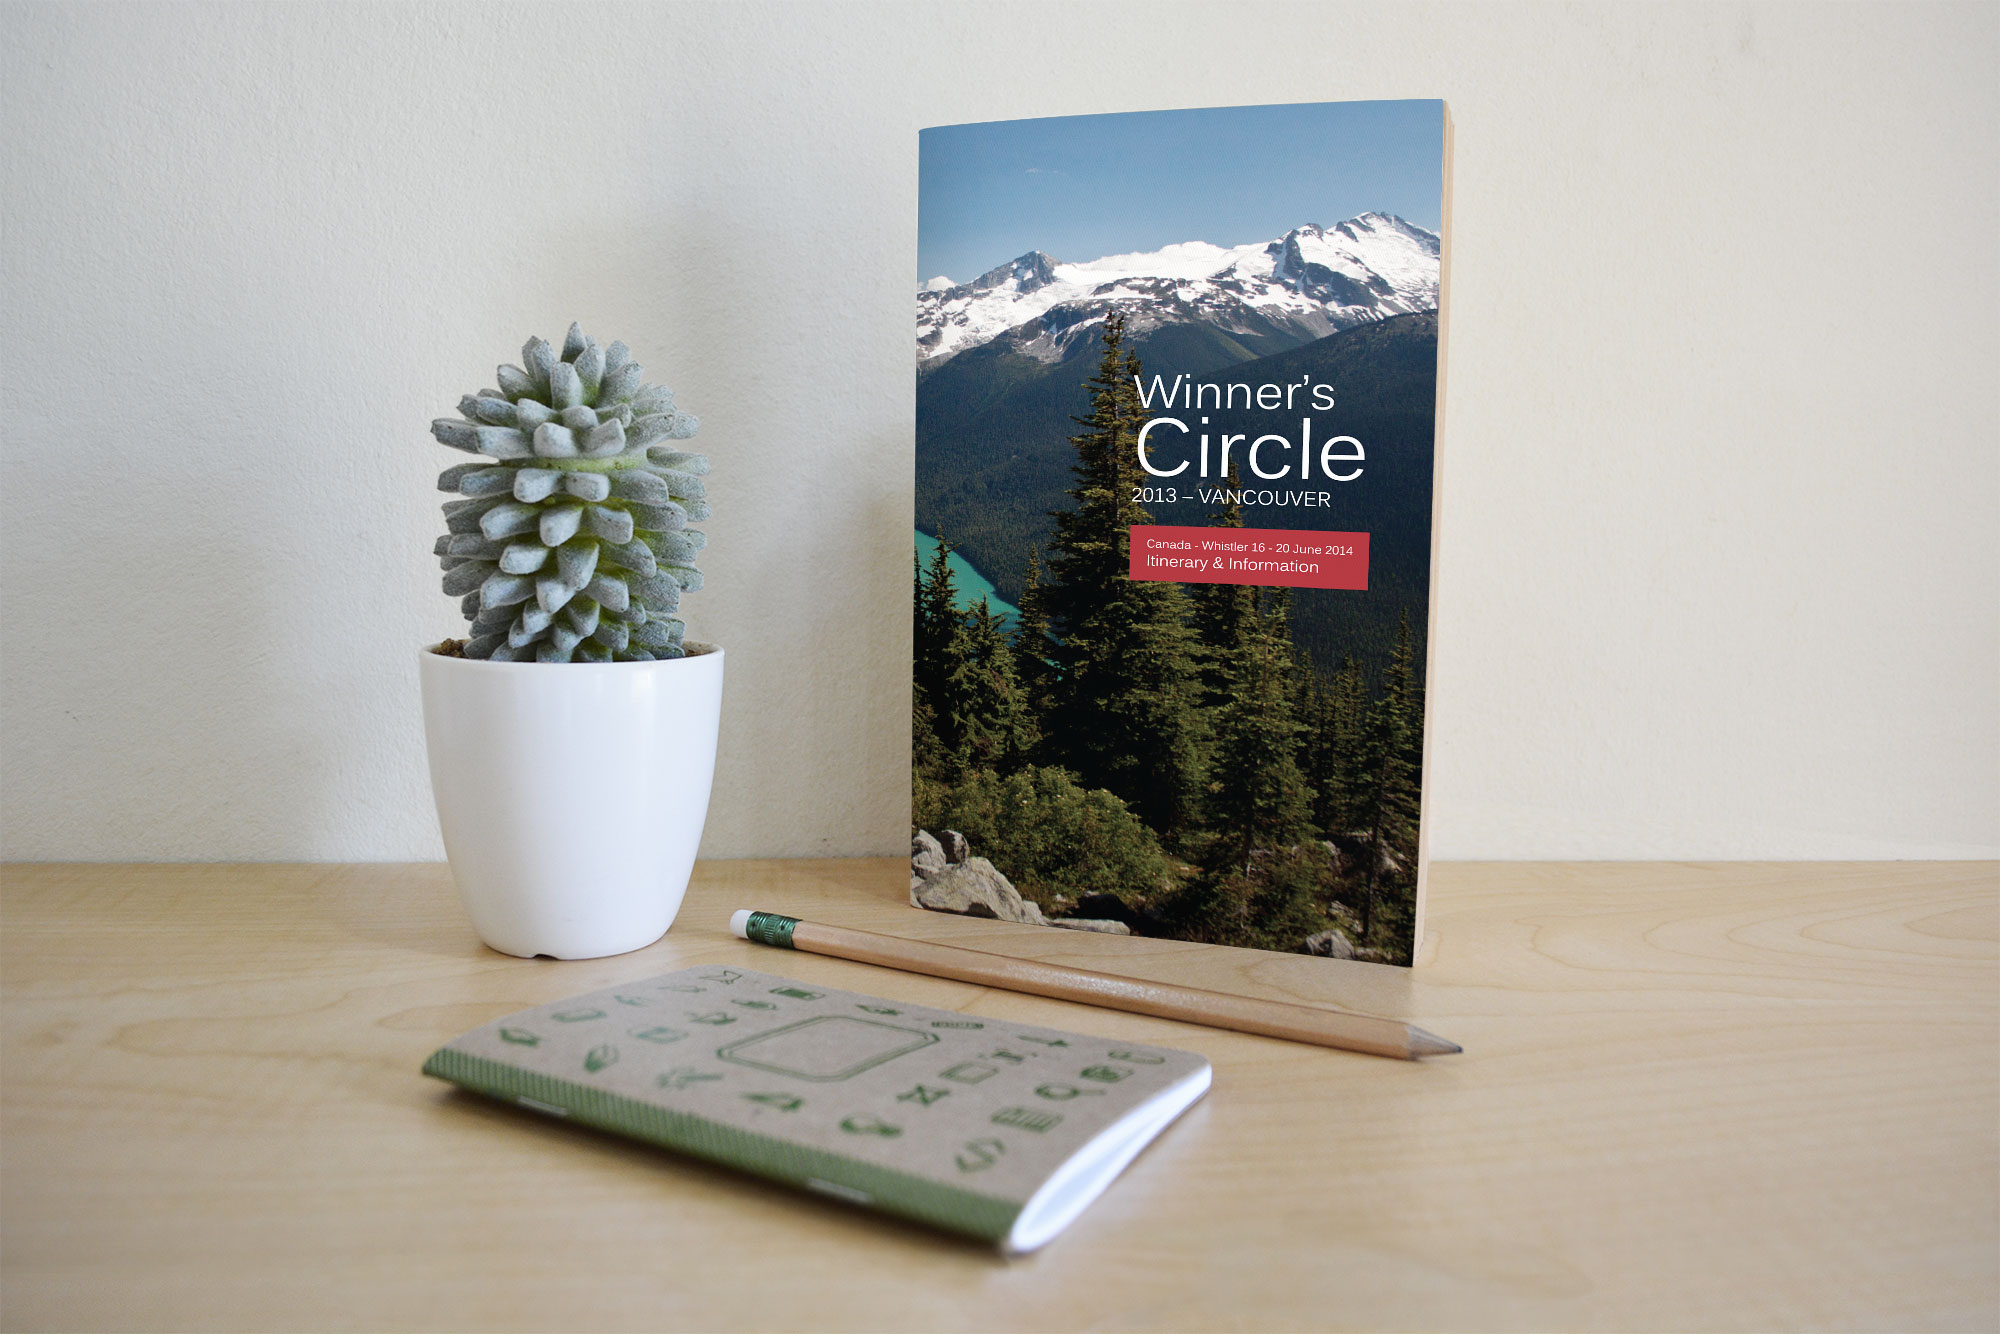 Winner's Circle – Vancouver